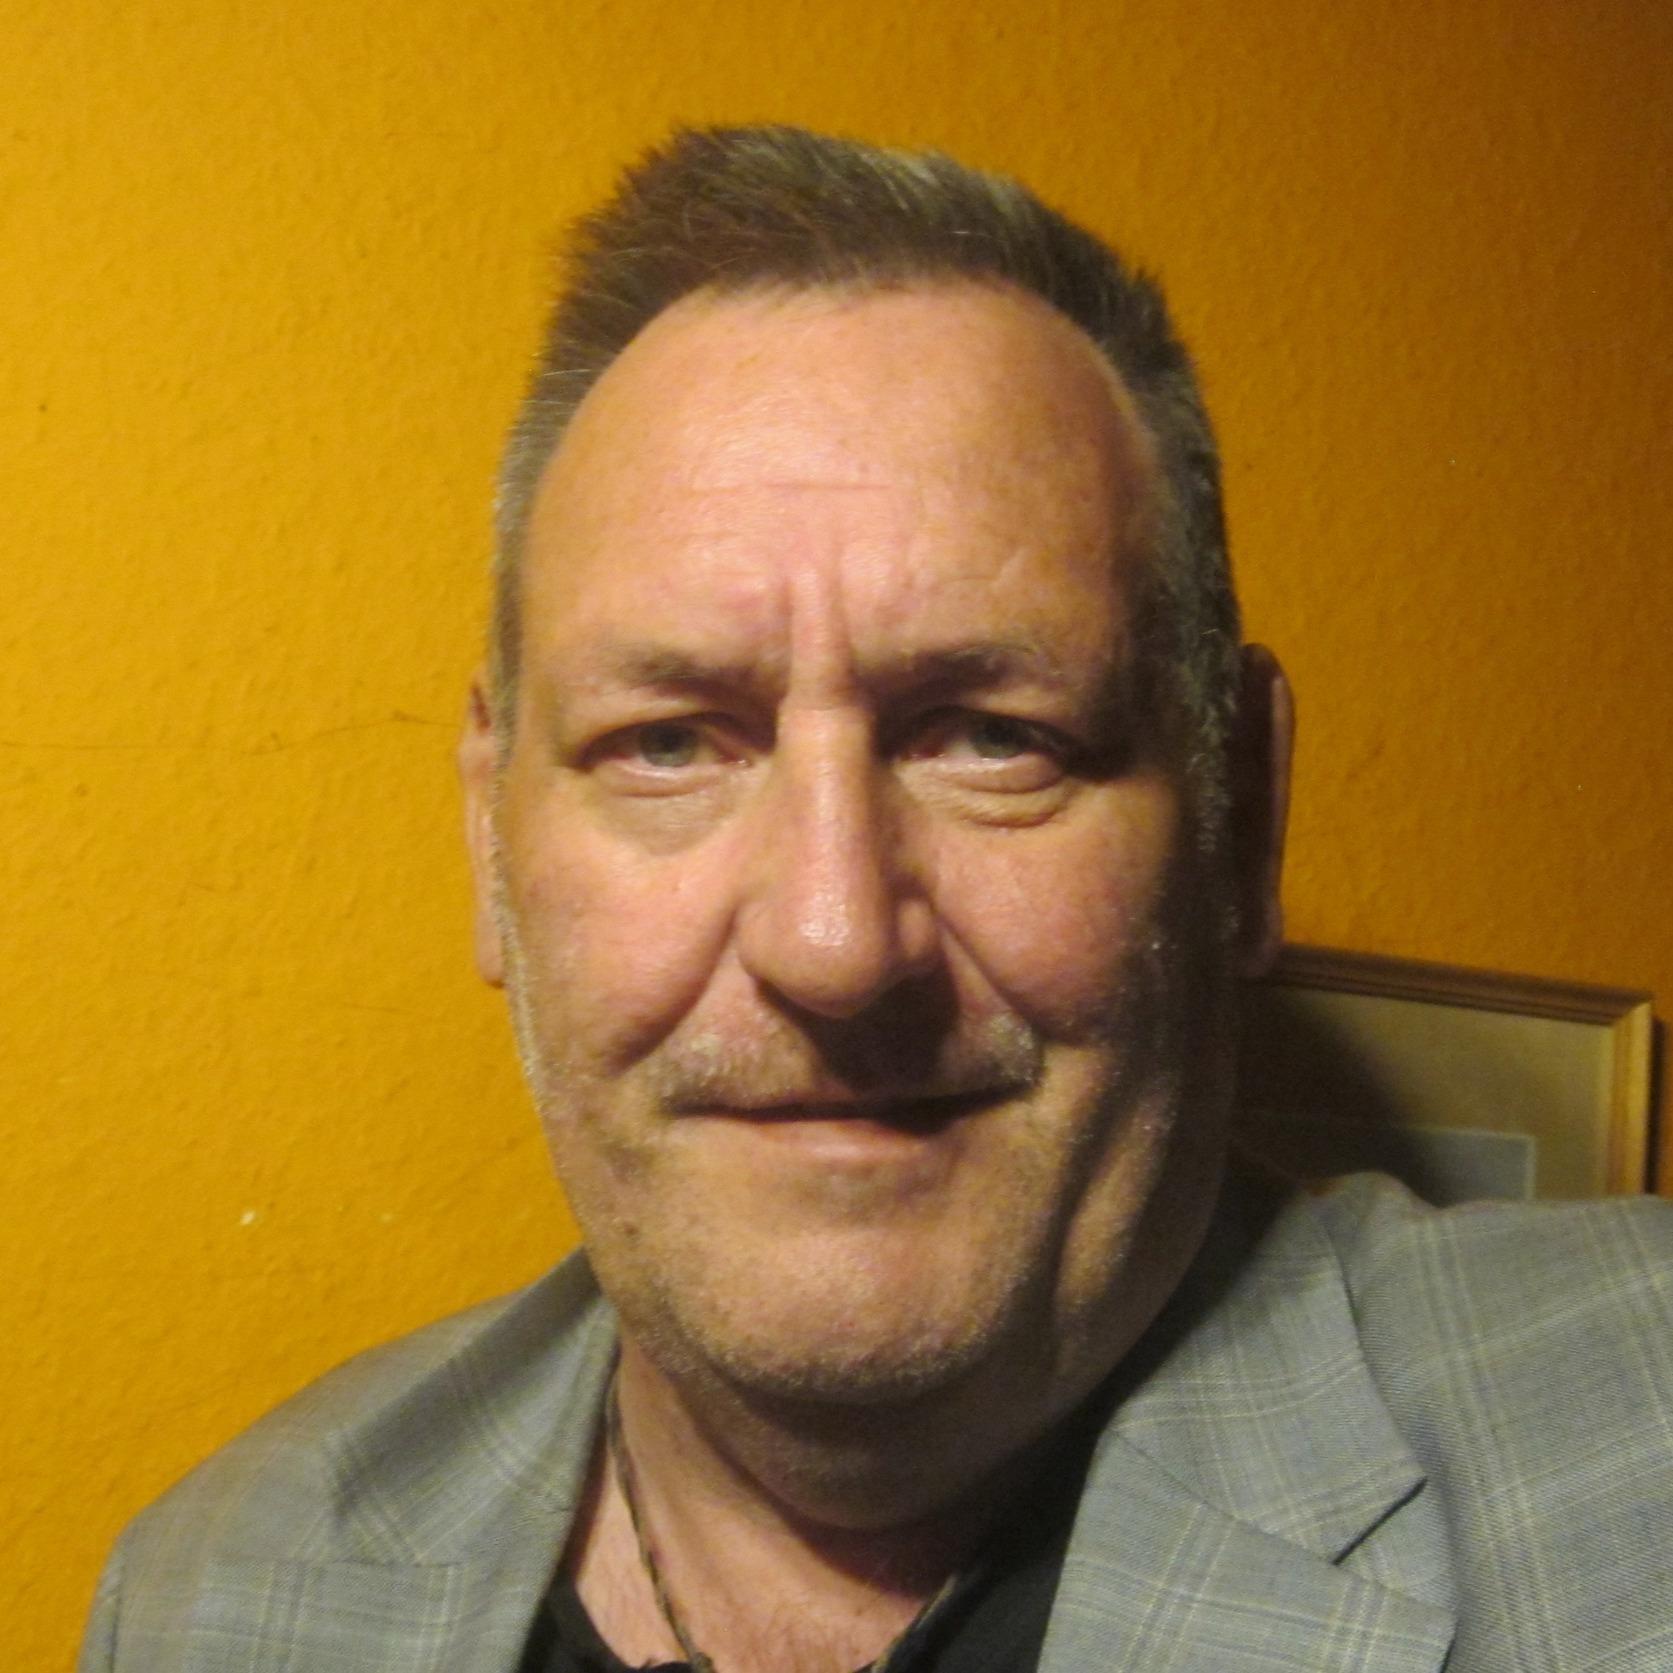 Detlef Sven Birr